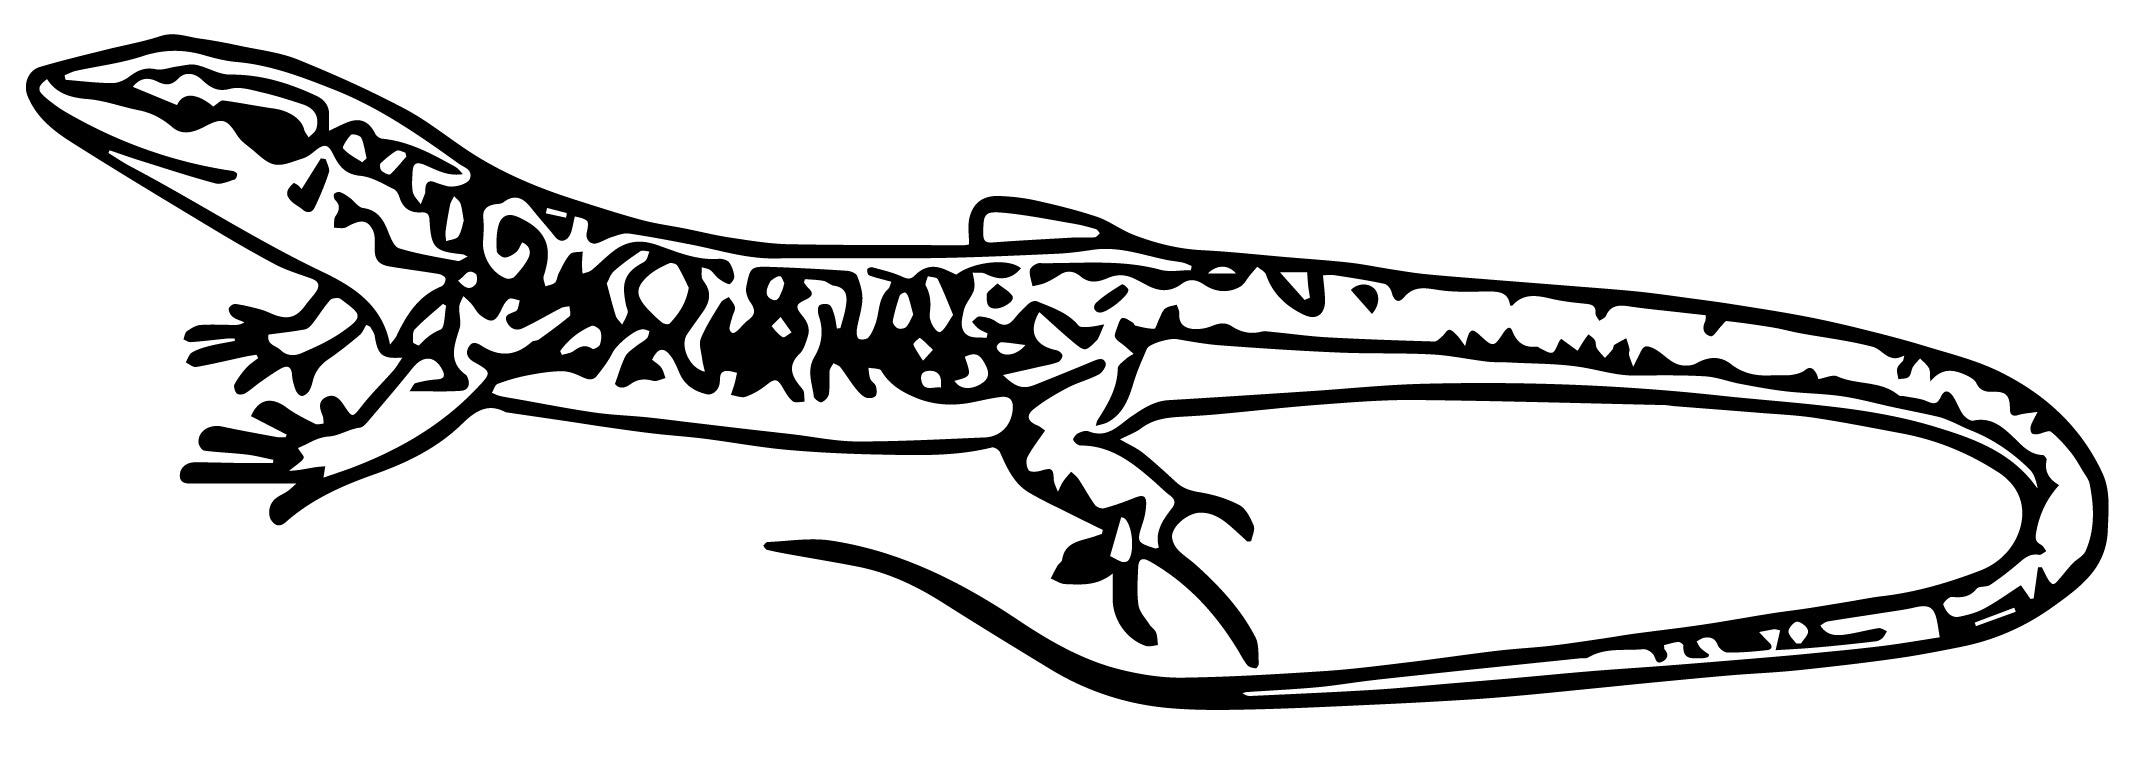 Lizard Jpeg Coloring Page WeColoringPage 19